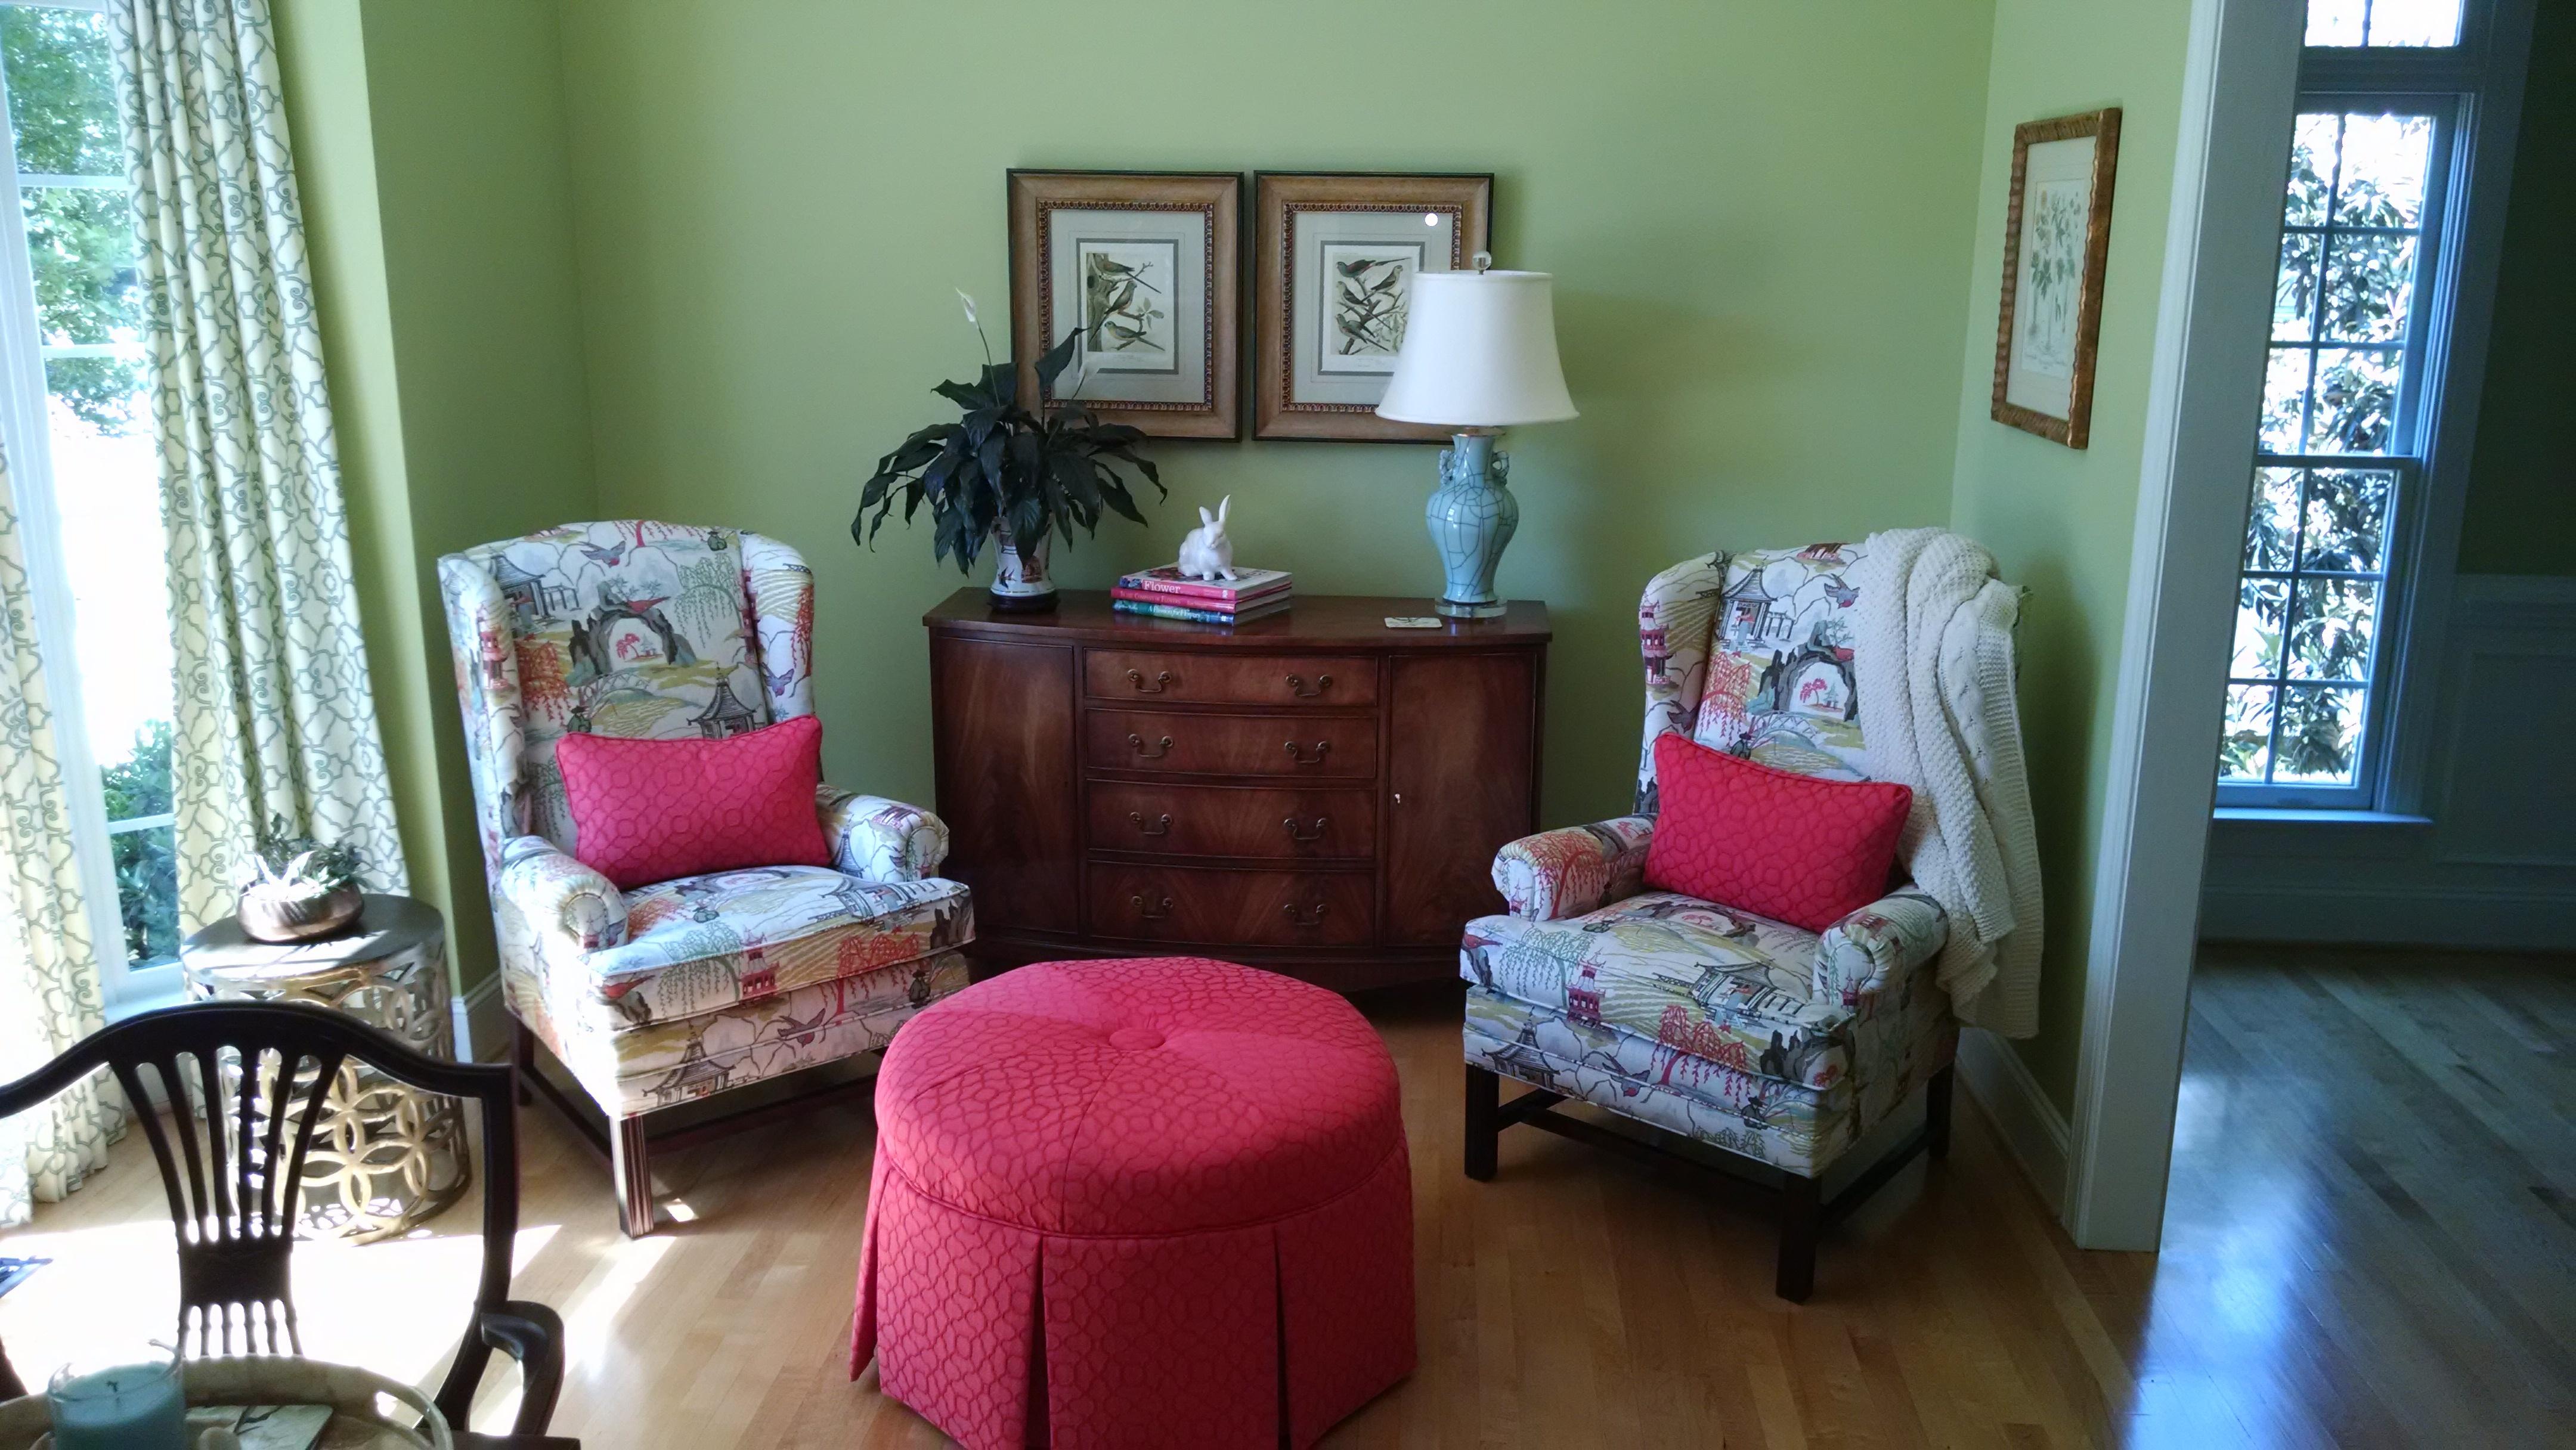 Two hours of interior design services - Interior decorator cost per hour ...